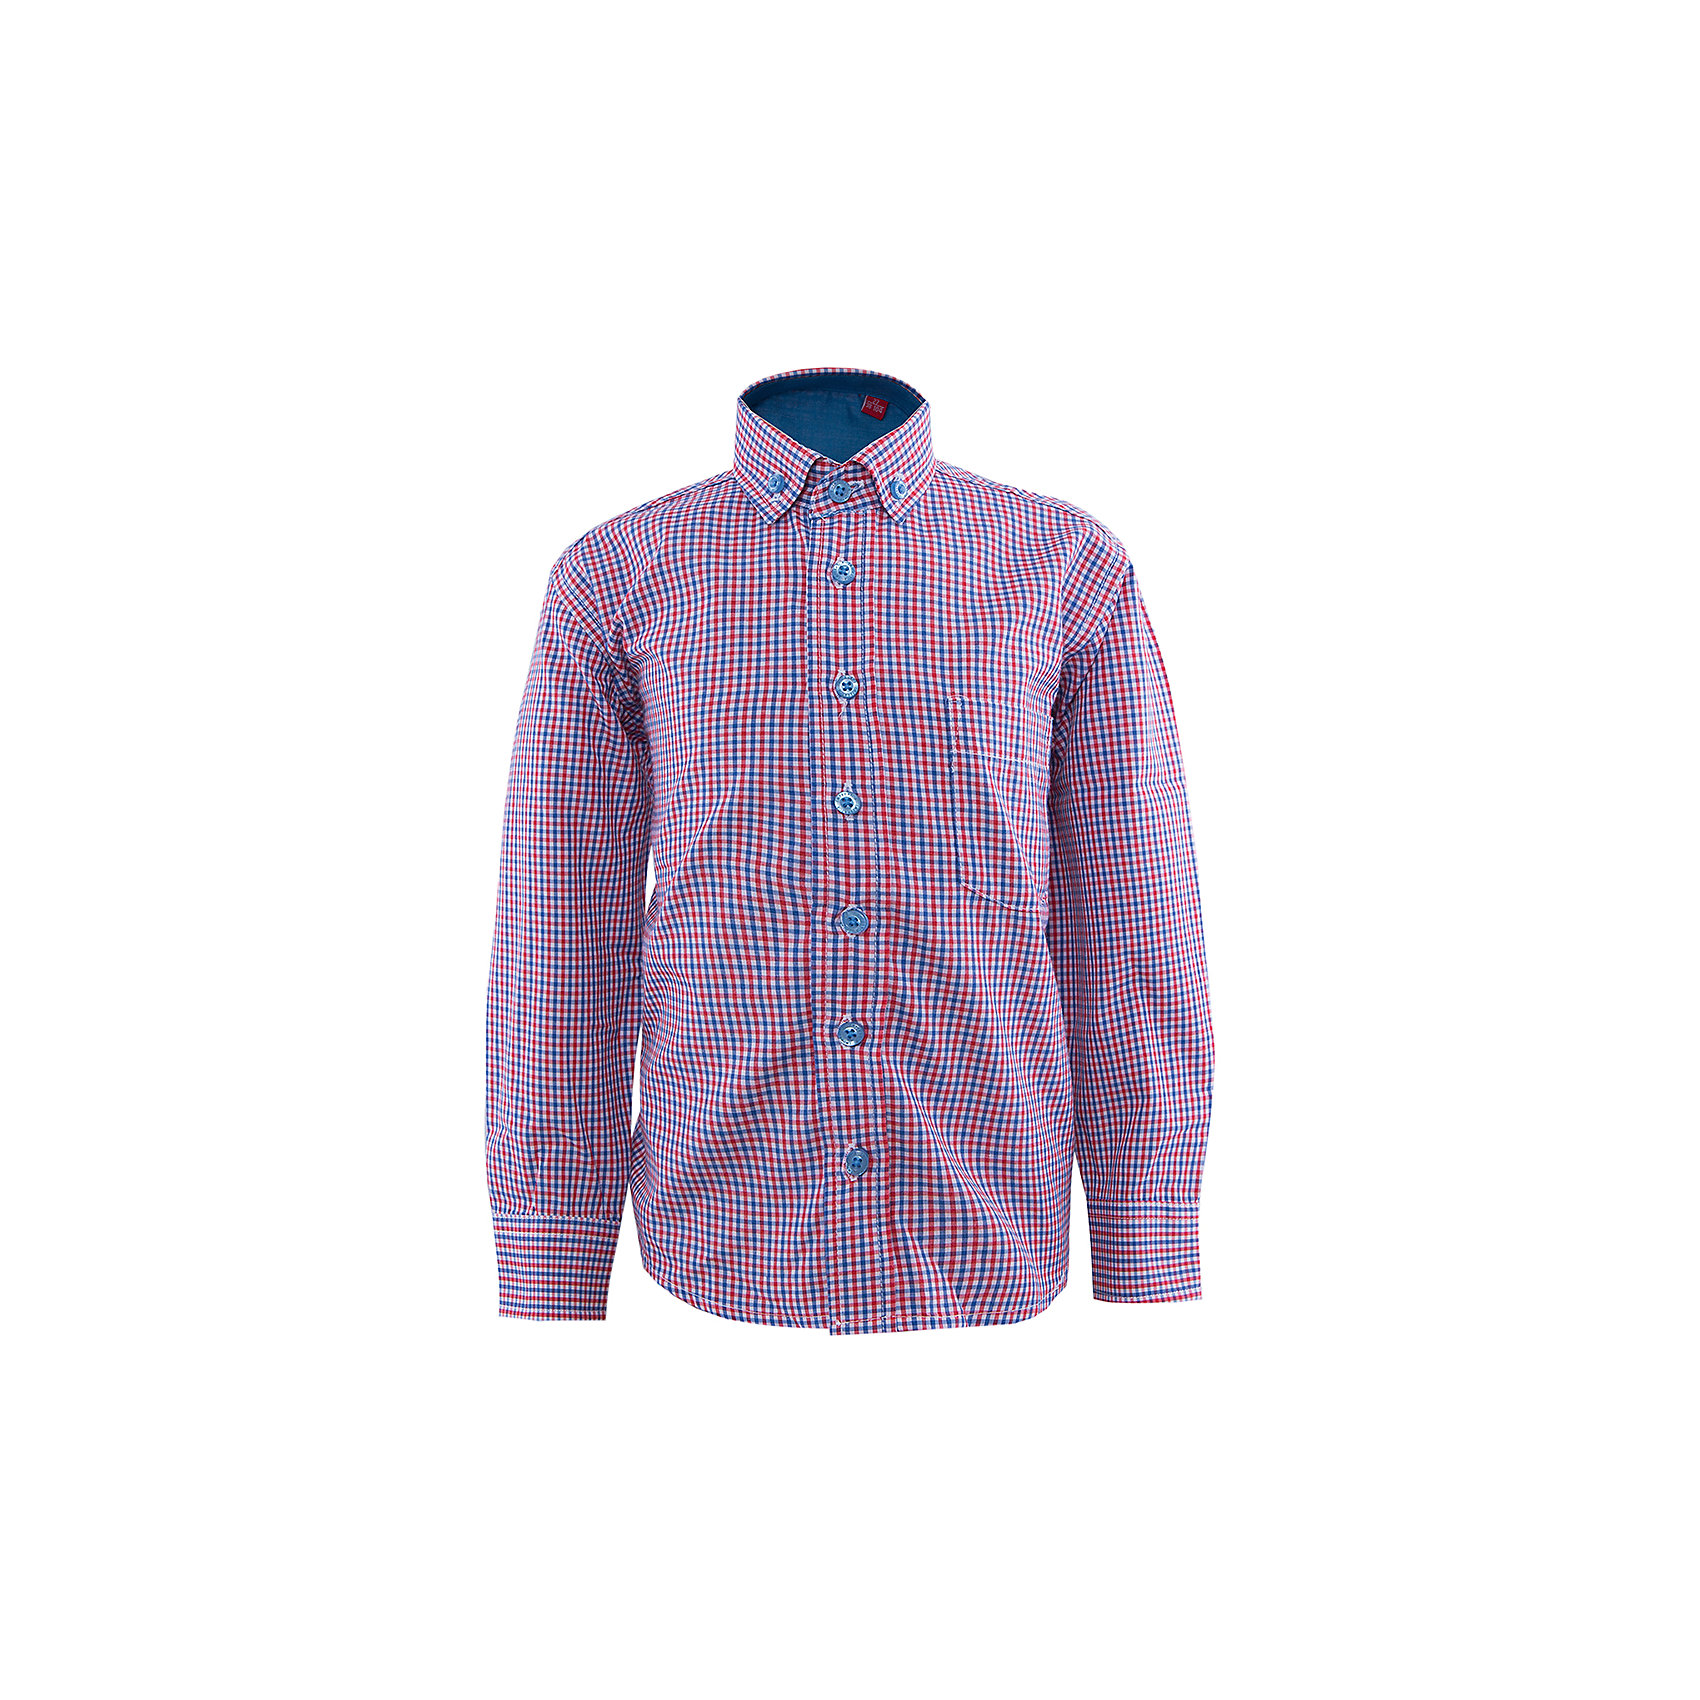 Imperator Рубашка для мальчика Imperator цены онлайн